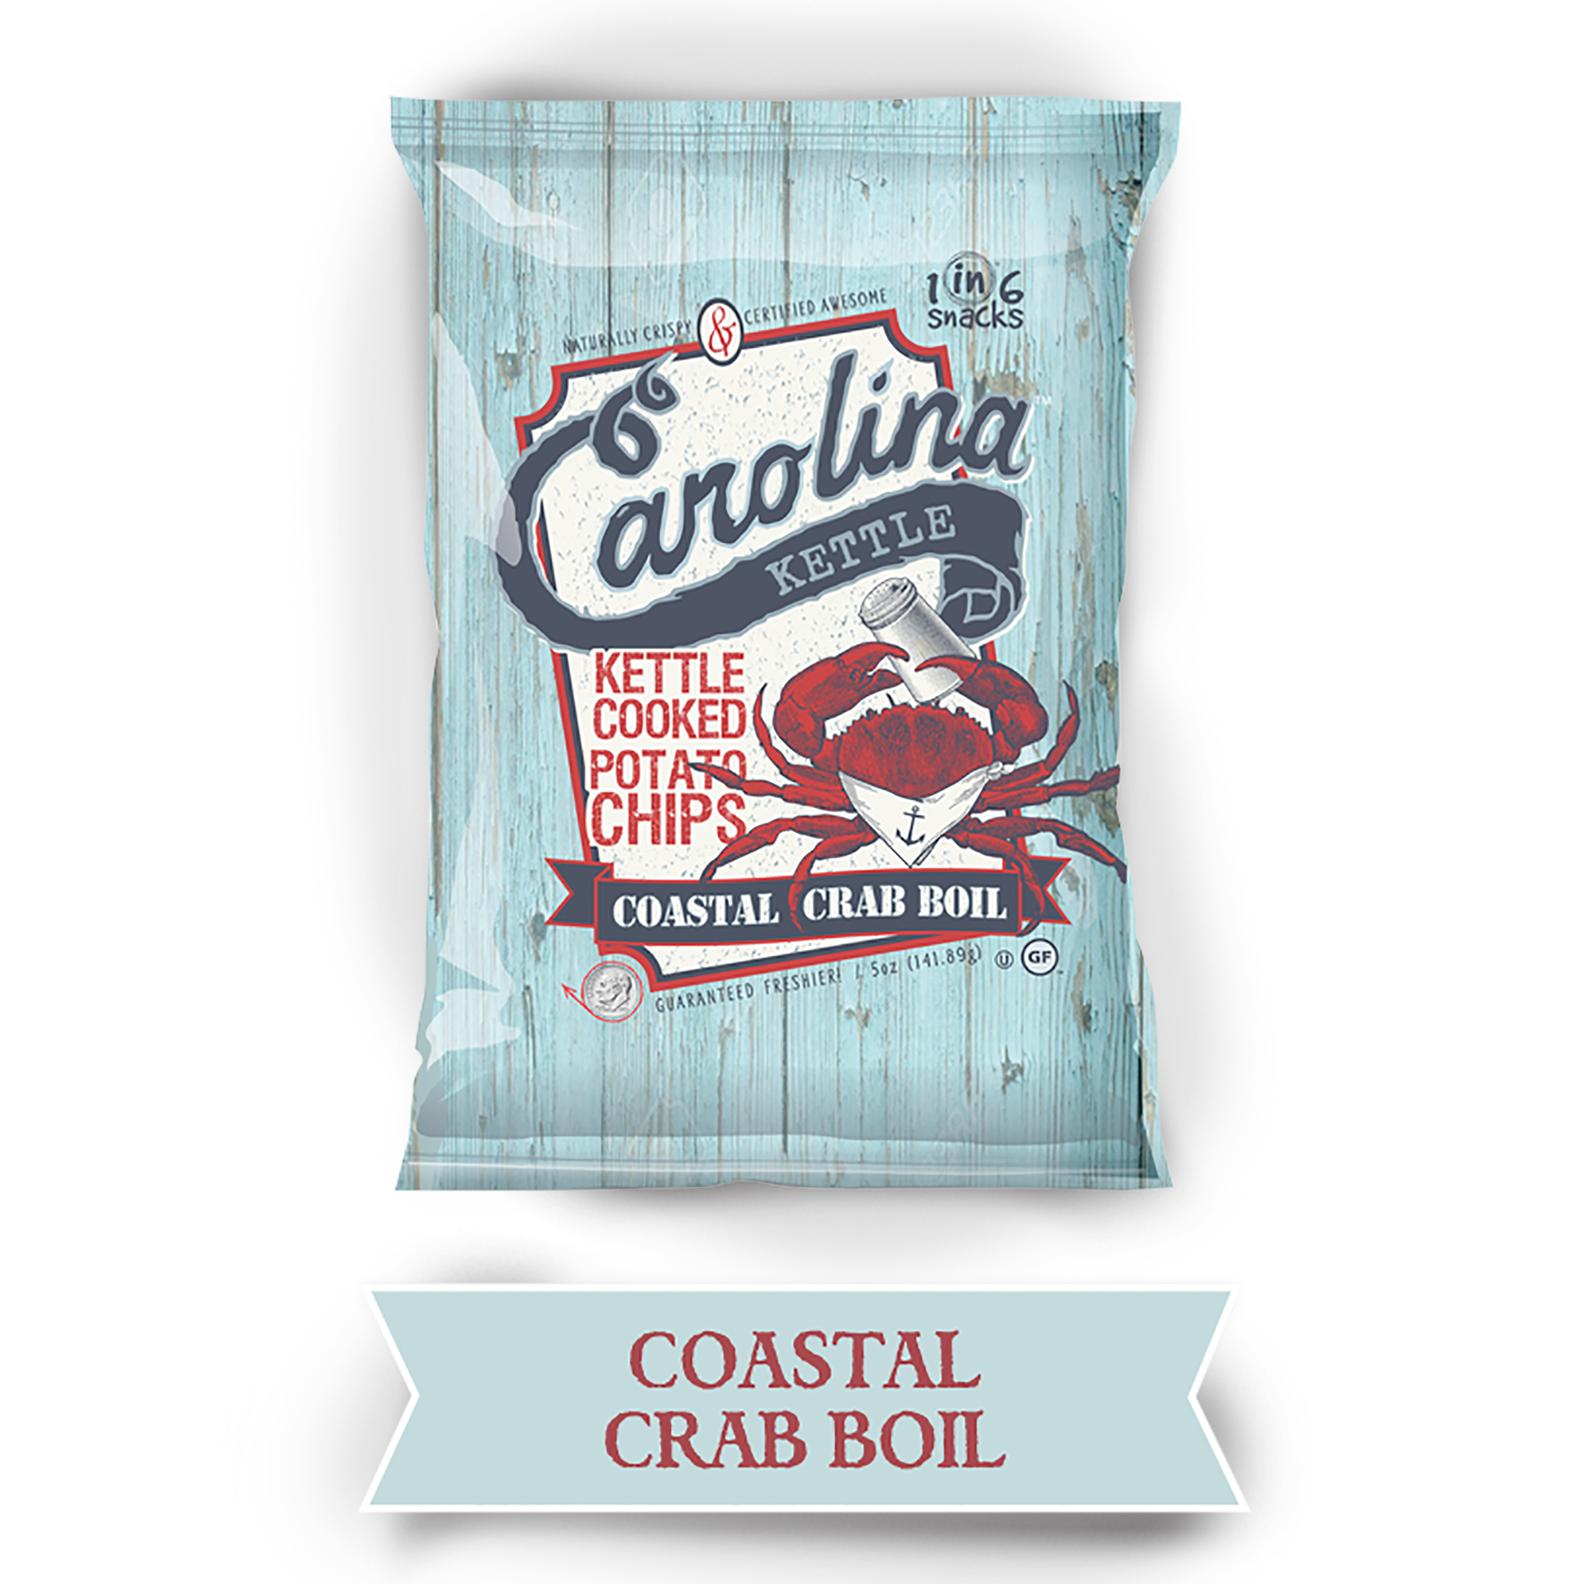 Carolina Kettle Coastal Crab Boil Potato Chips, 2oz